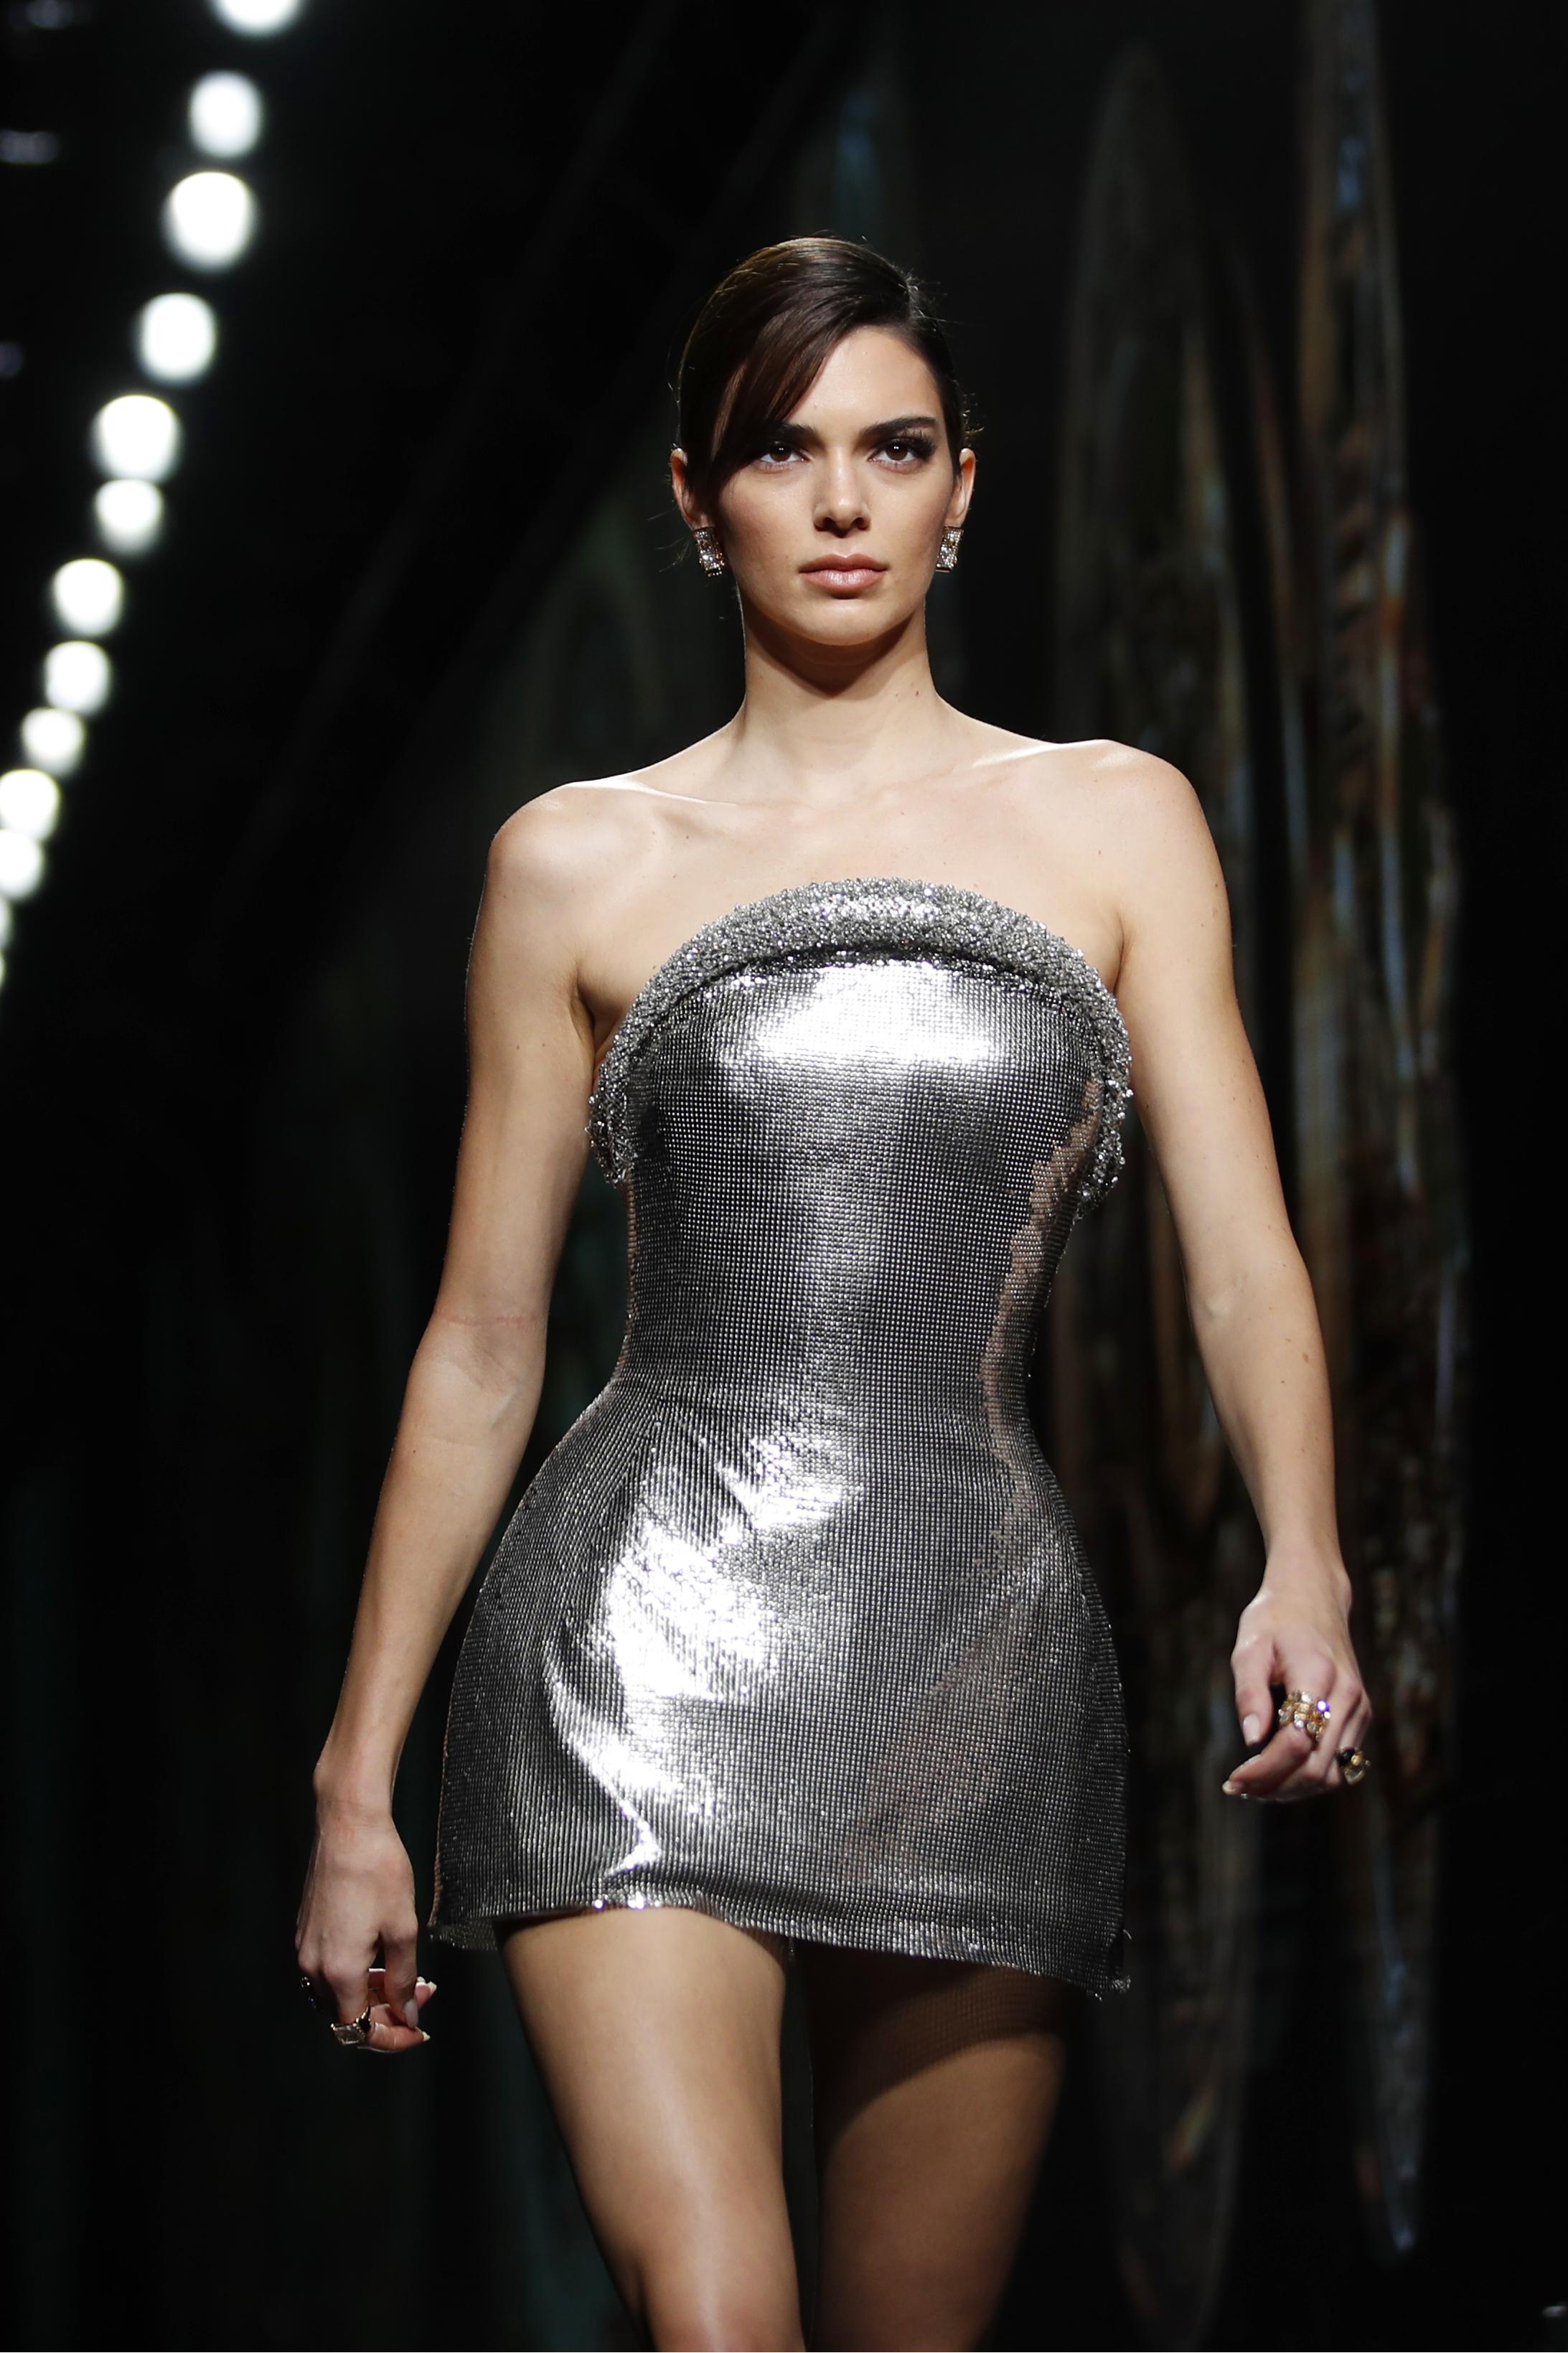 Kendall Jenner modeló un ajustado vestido plateado. (AP)